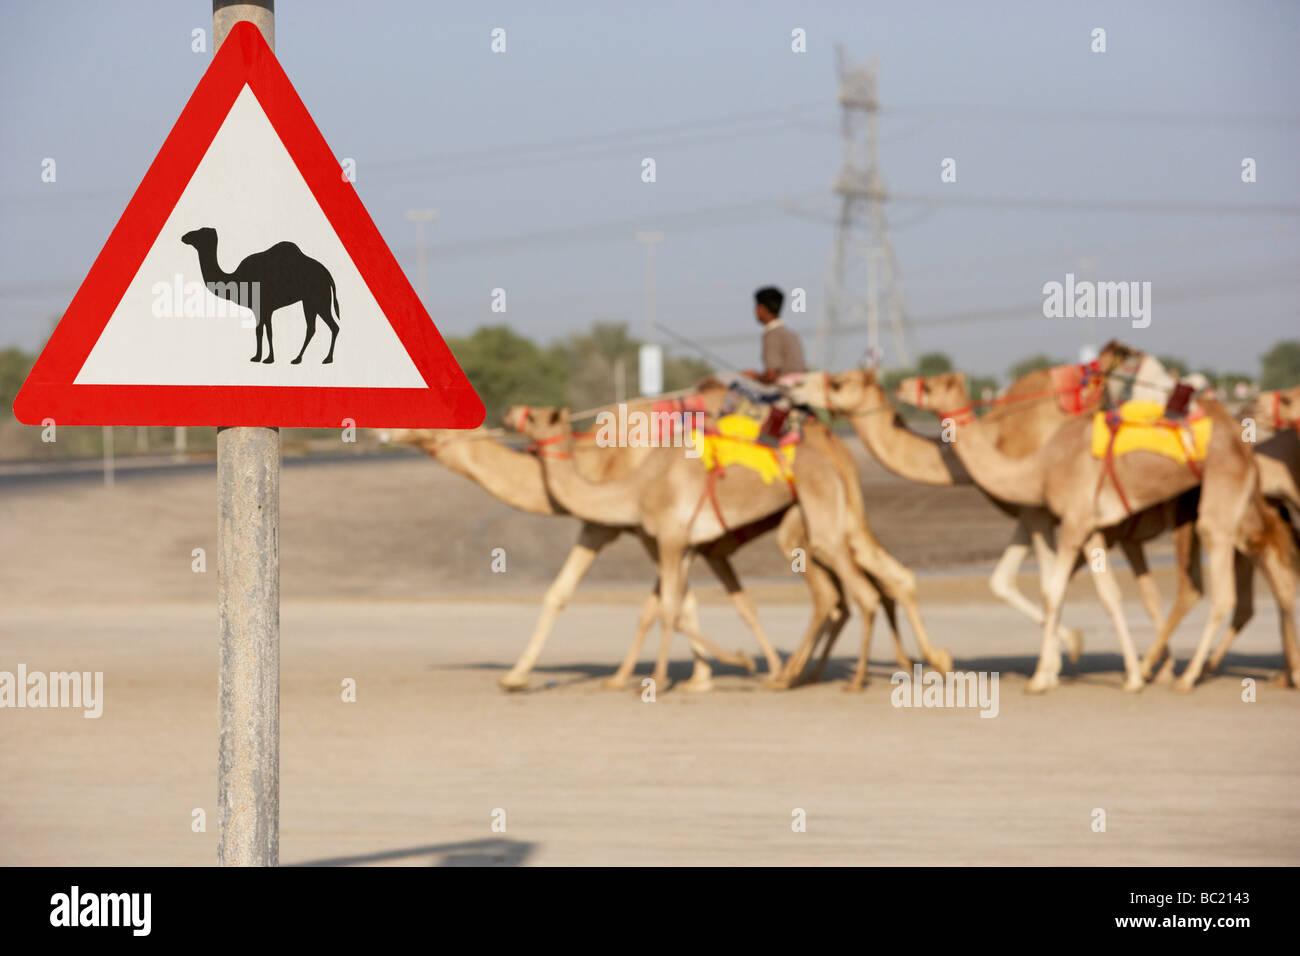 Beware Of Camel Sign In Dubai - Stock Image